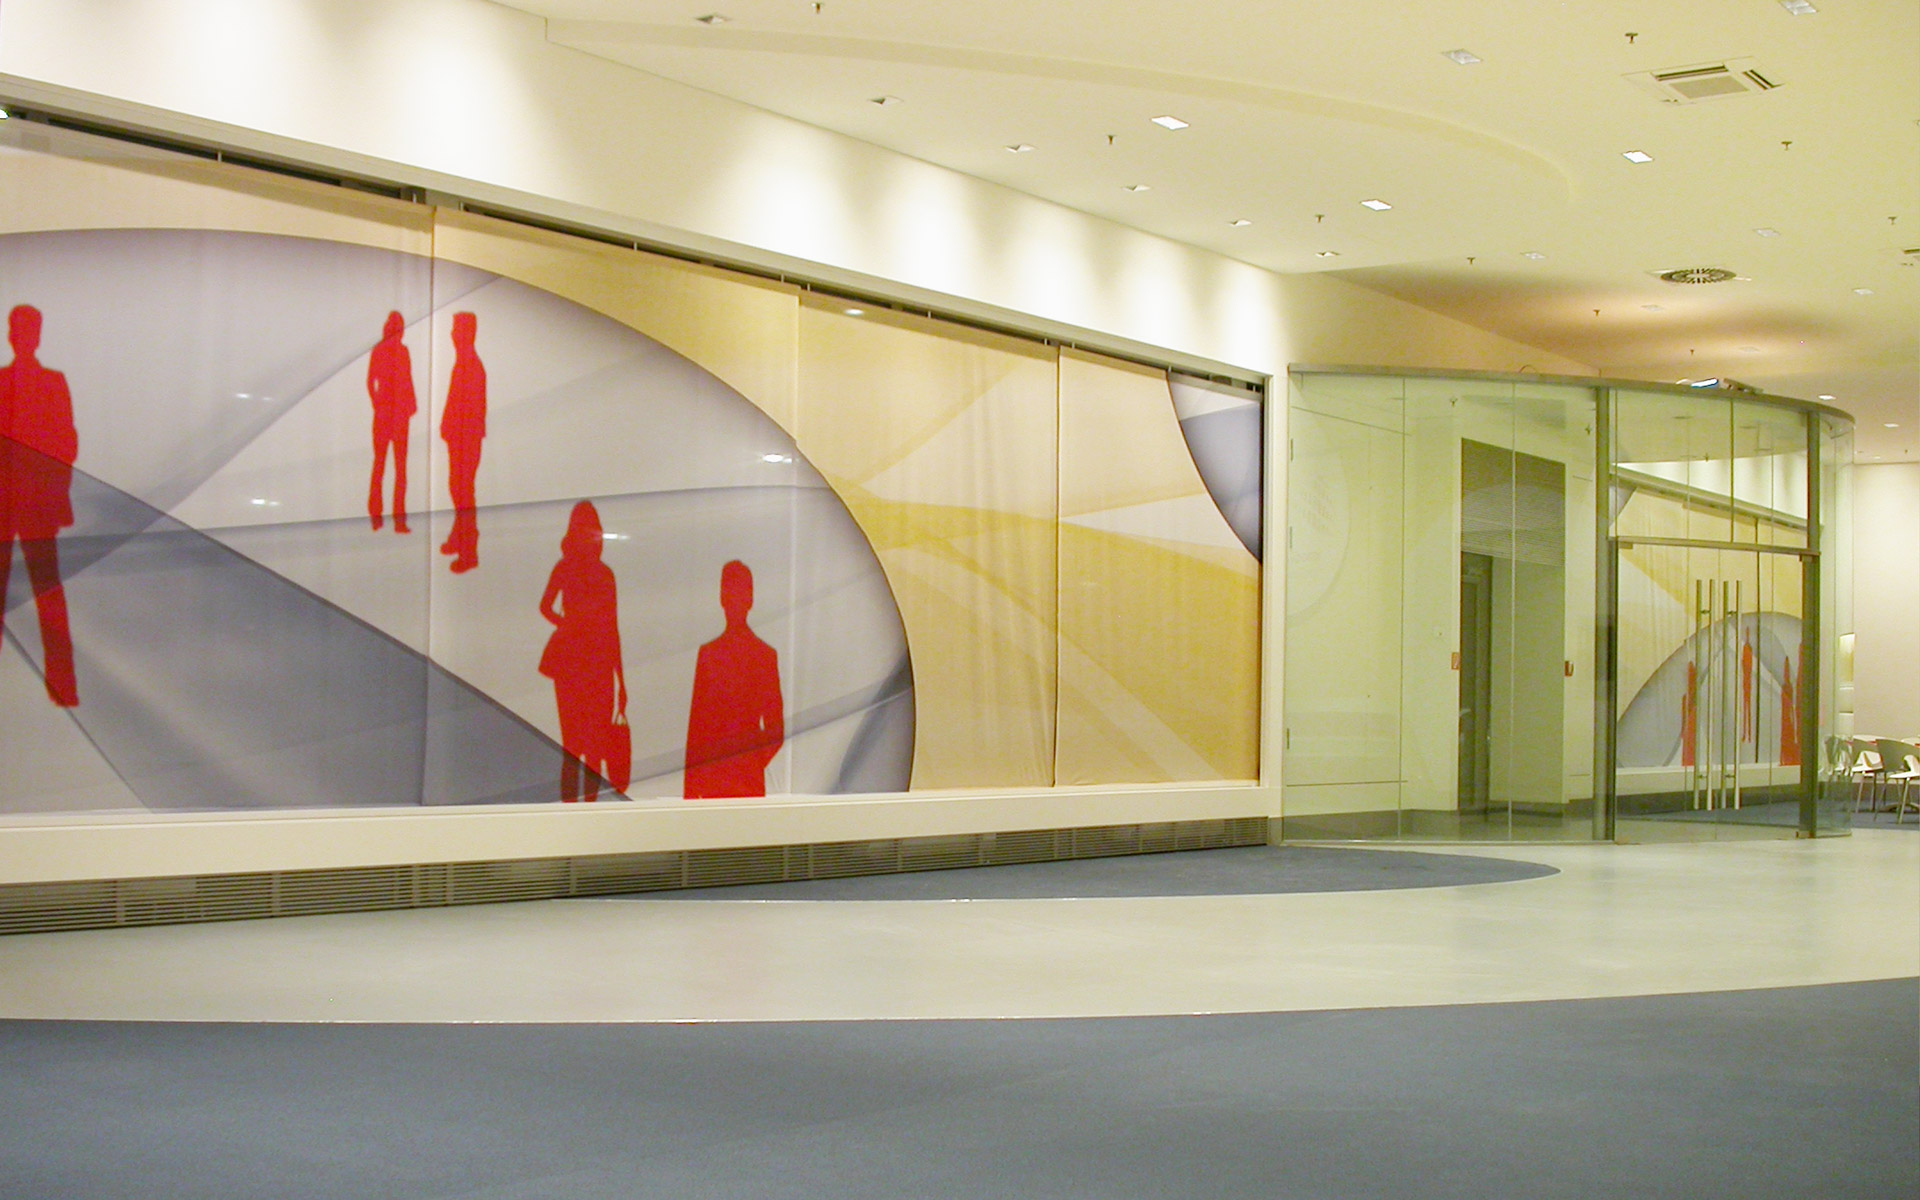 wisuell_wigge-Metro-Future Store